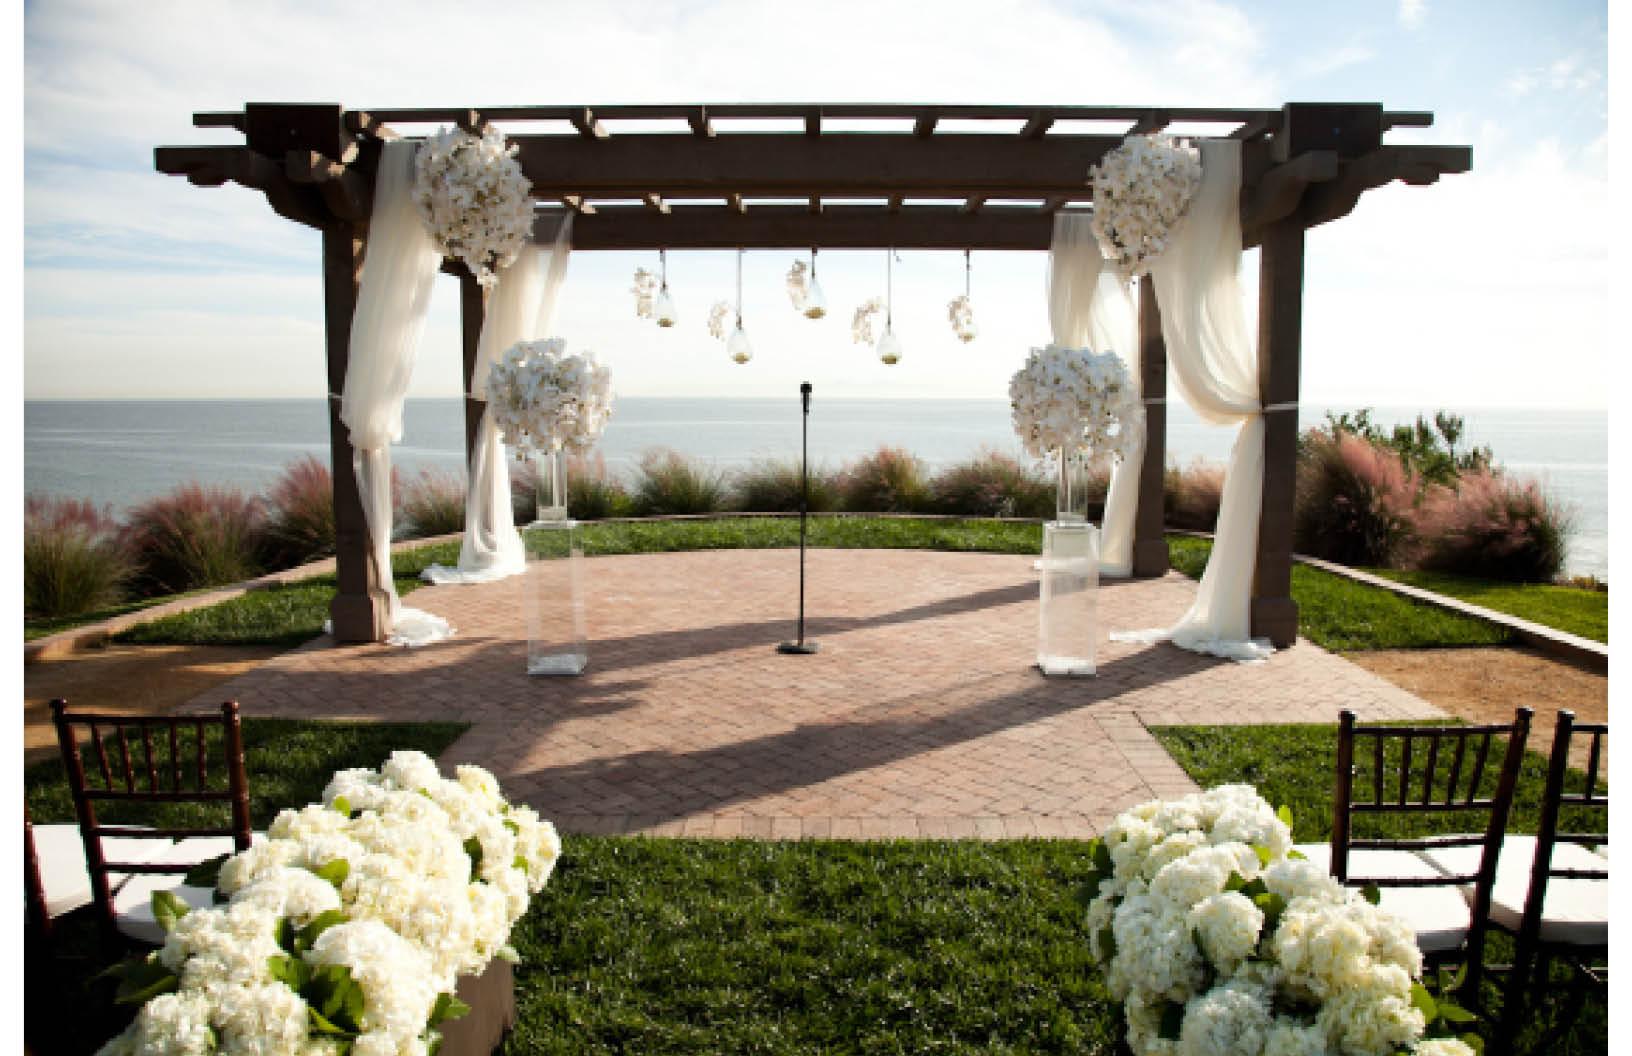 real weddings weddings and tagged adam sjoberg cupcakes couture manhattan beach nisies enchanted florist samuel lippke studios terranea resort